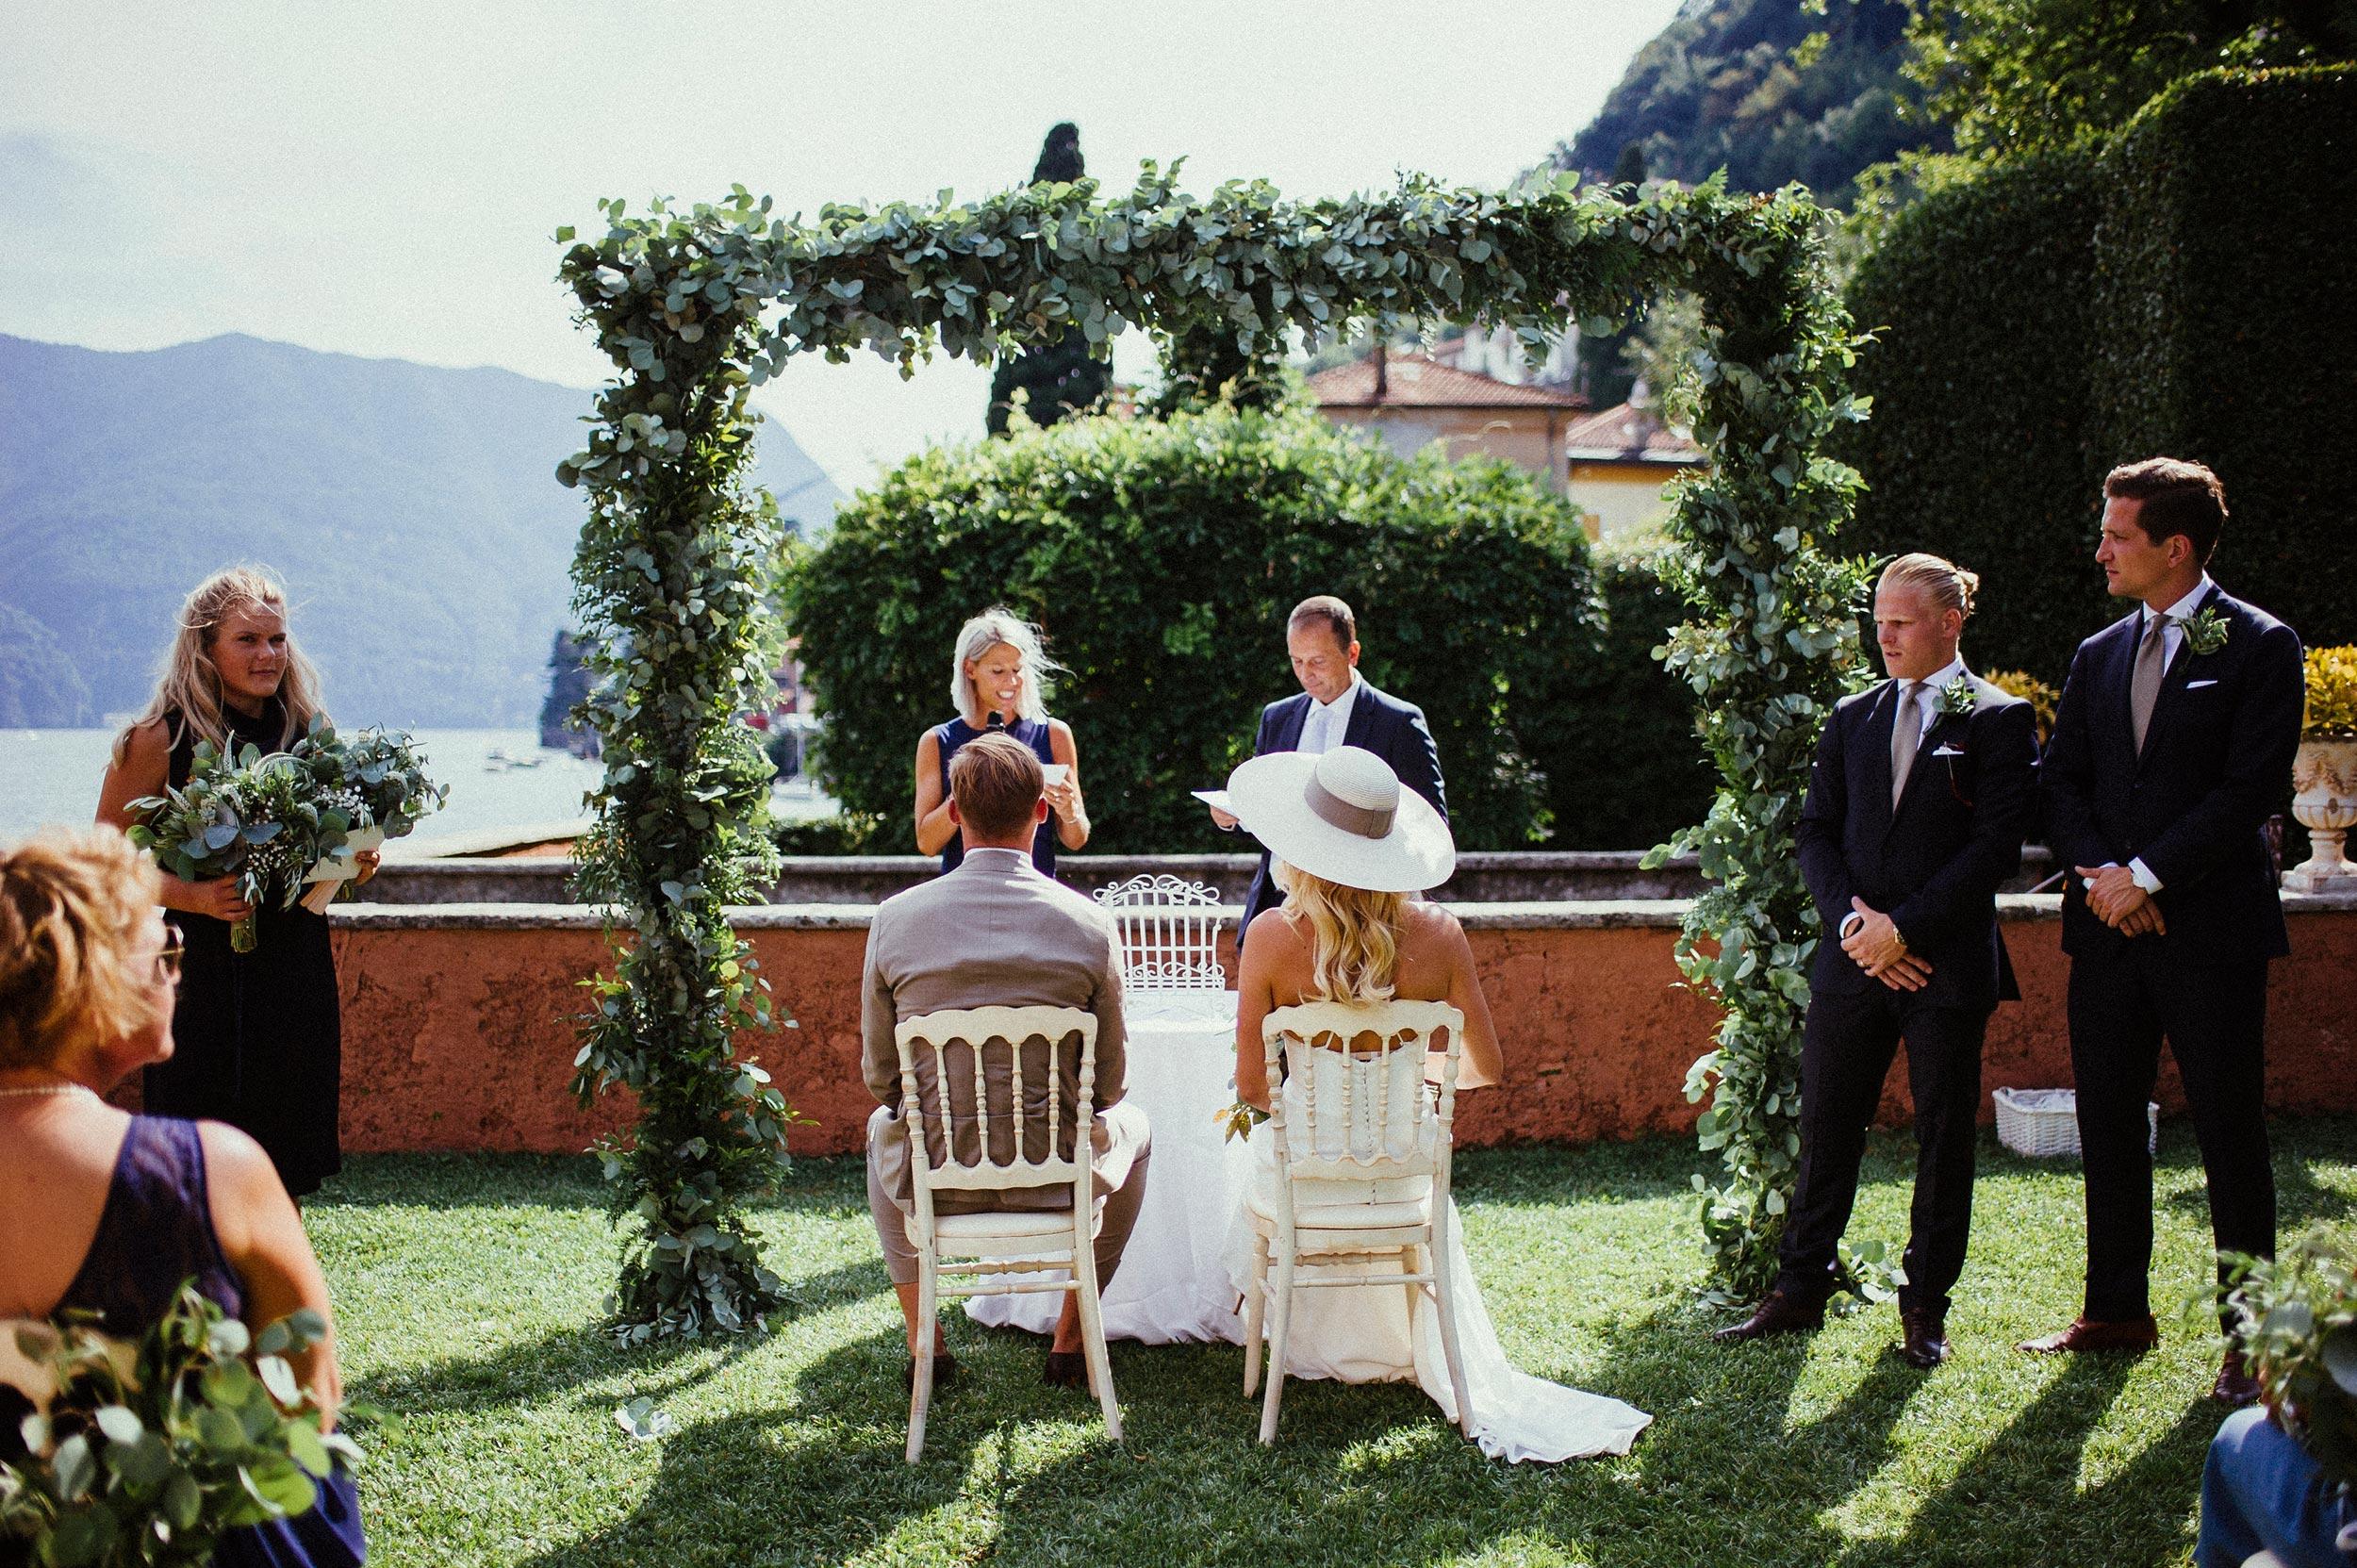 2018-Villa-Regina-Teodolinda-Lake-Como-Wedding-Photographer-Italy-Alessandro-Avenali-170.jpg